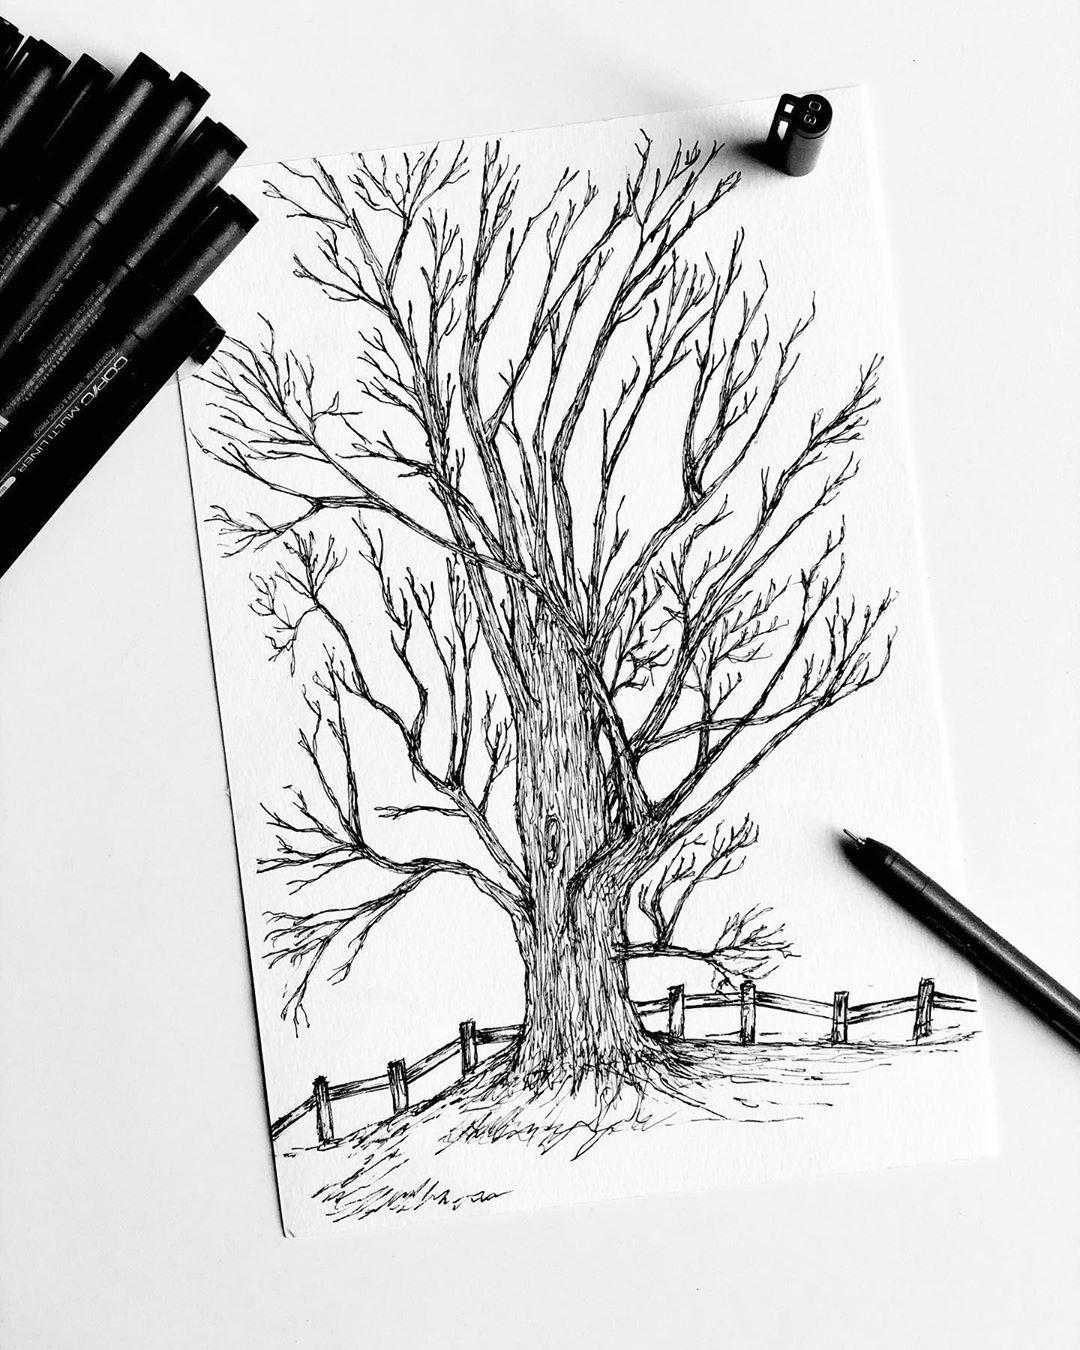 Art Artist Inkart Blackandwhite Ink Pen Nature Draw